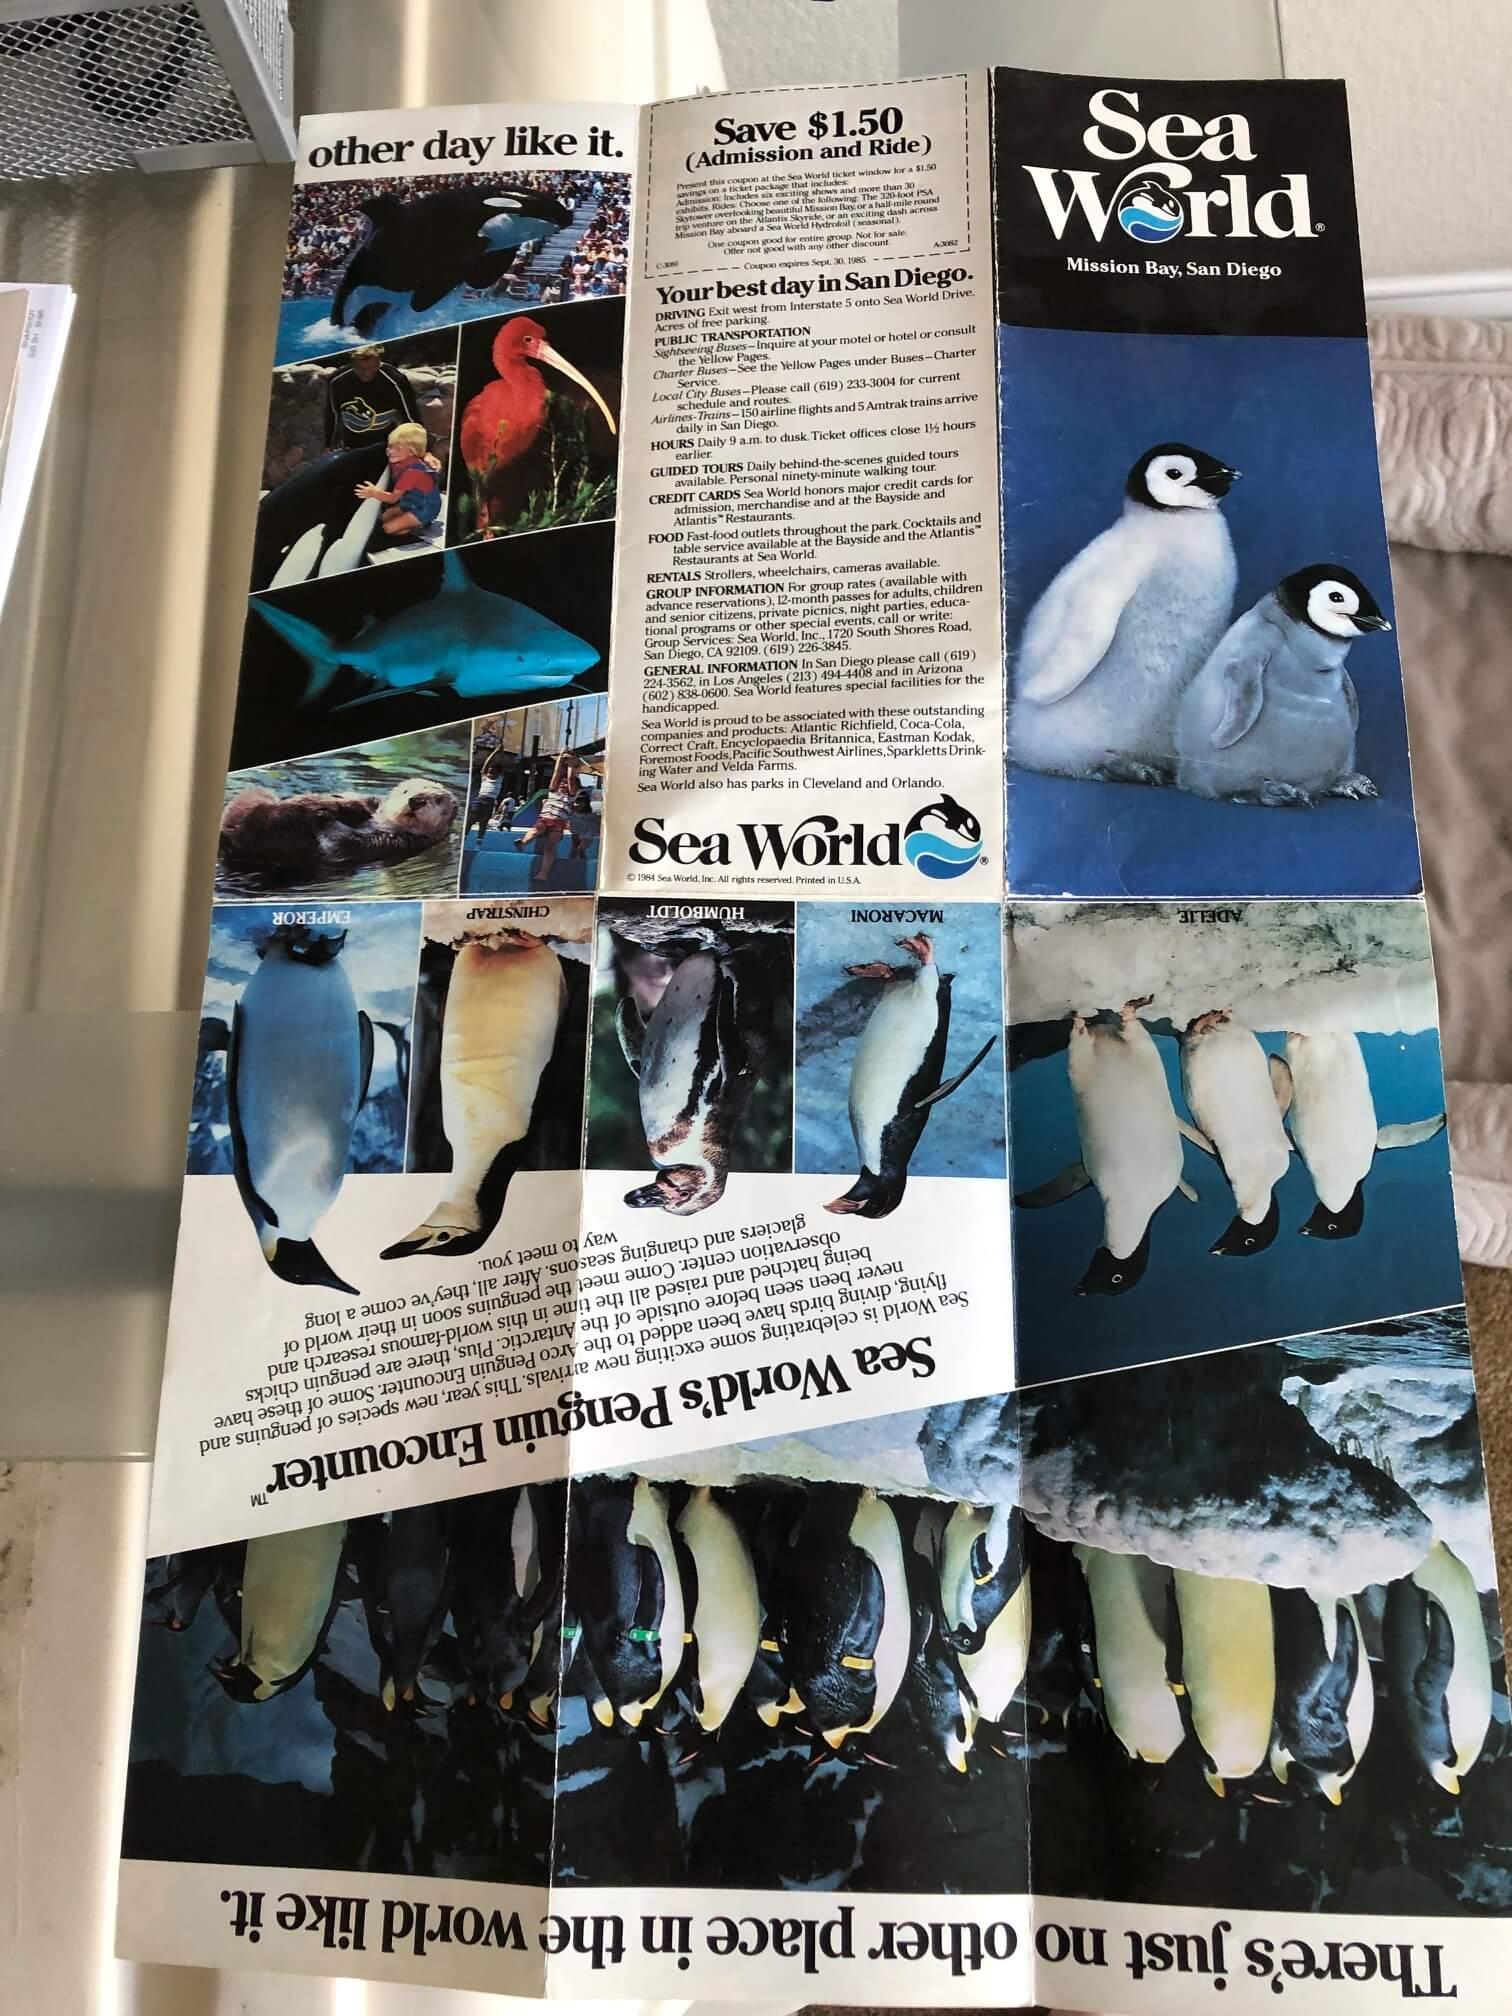 Joel Silverman Training Killer Whales